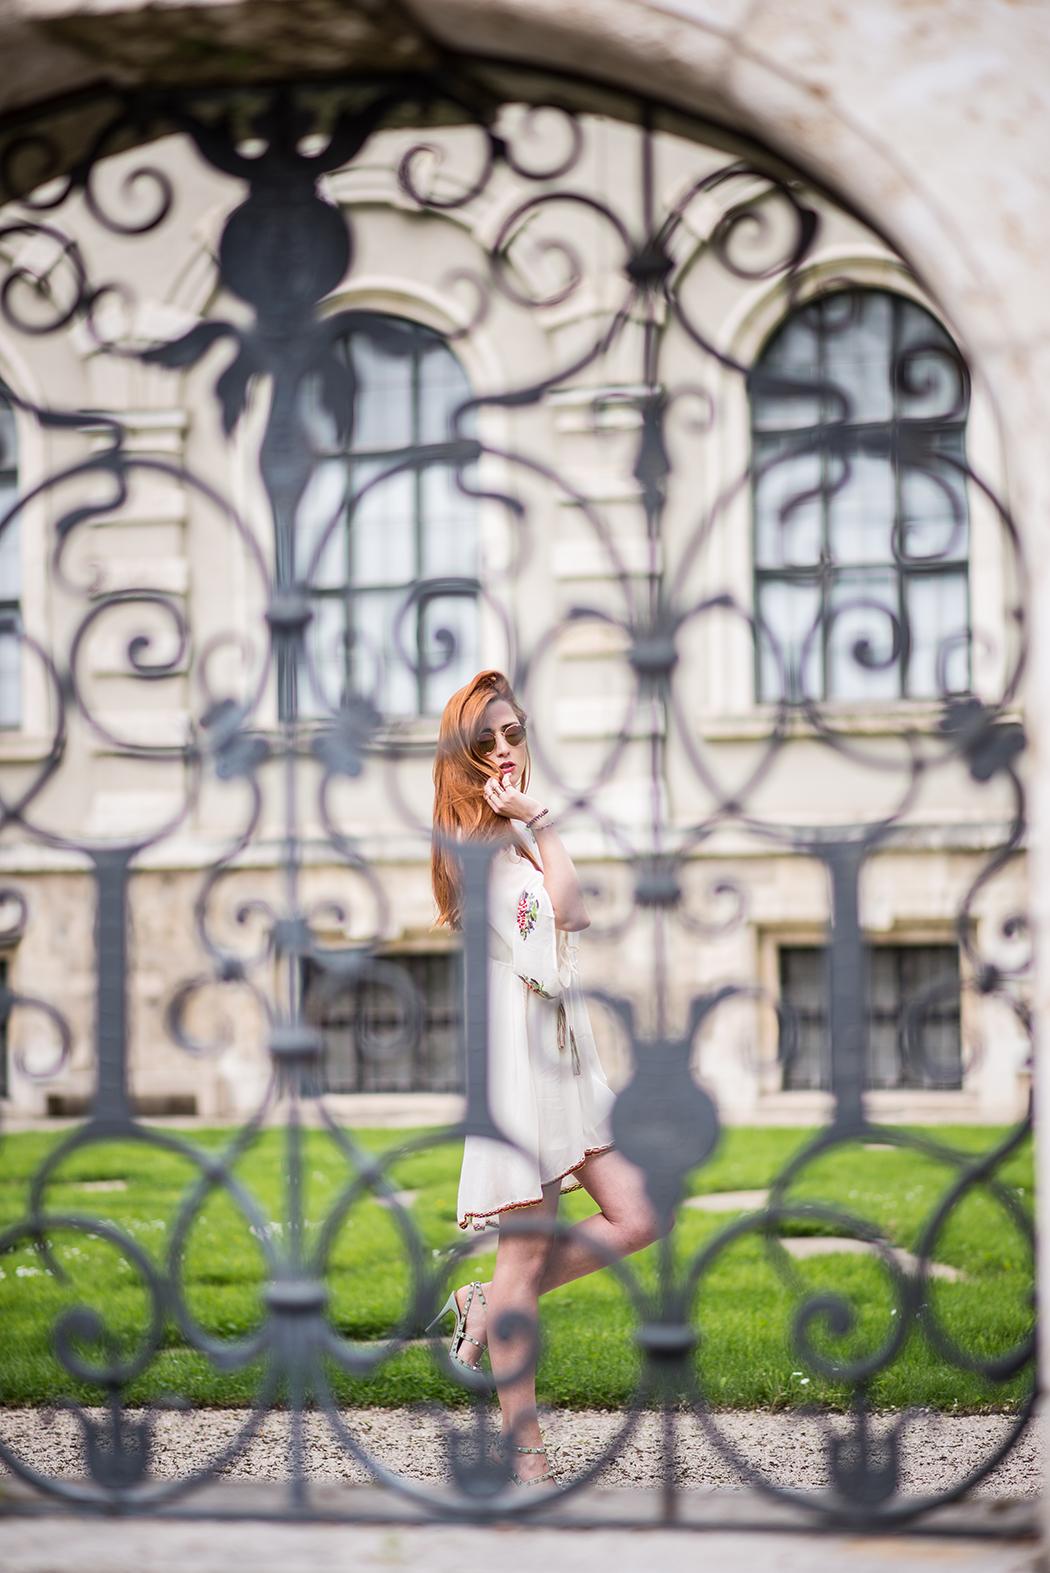 Twin-Set-Hippie-Kleid-Valentino-Rockstuds-Heels-Rote-Haare-Blogger-Linda-Rella-Fashionblog-Fashionblogger-Blog-Lifestyle-Linda-Fashion-8